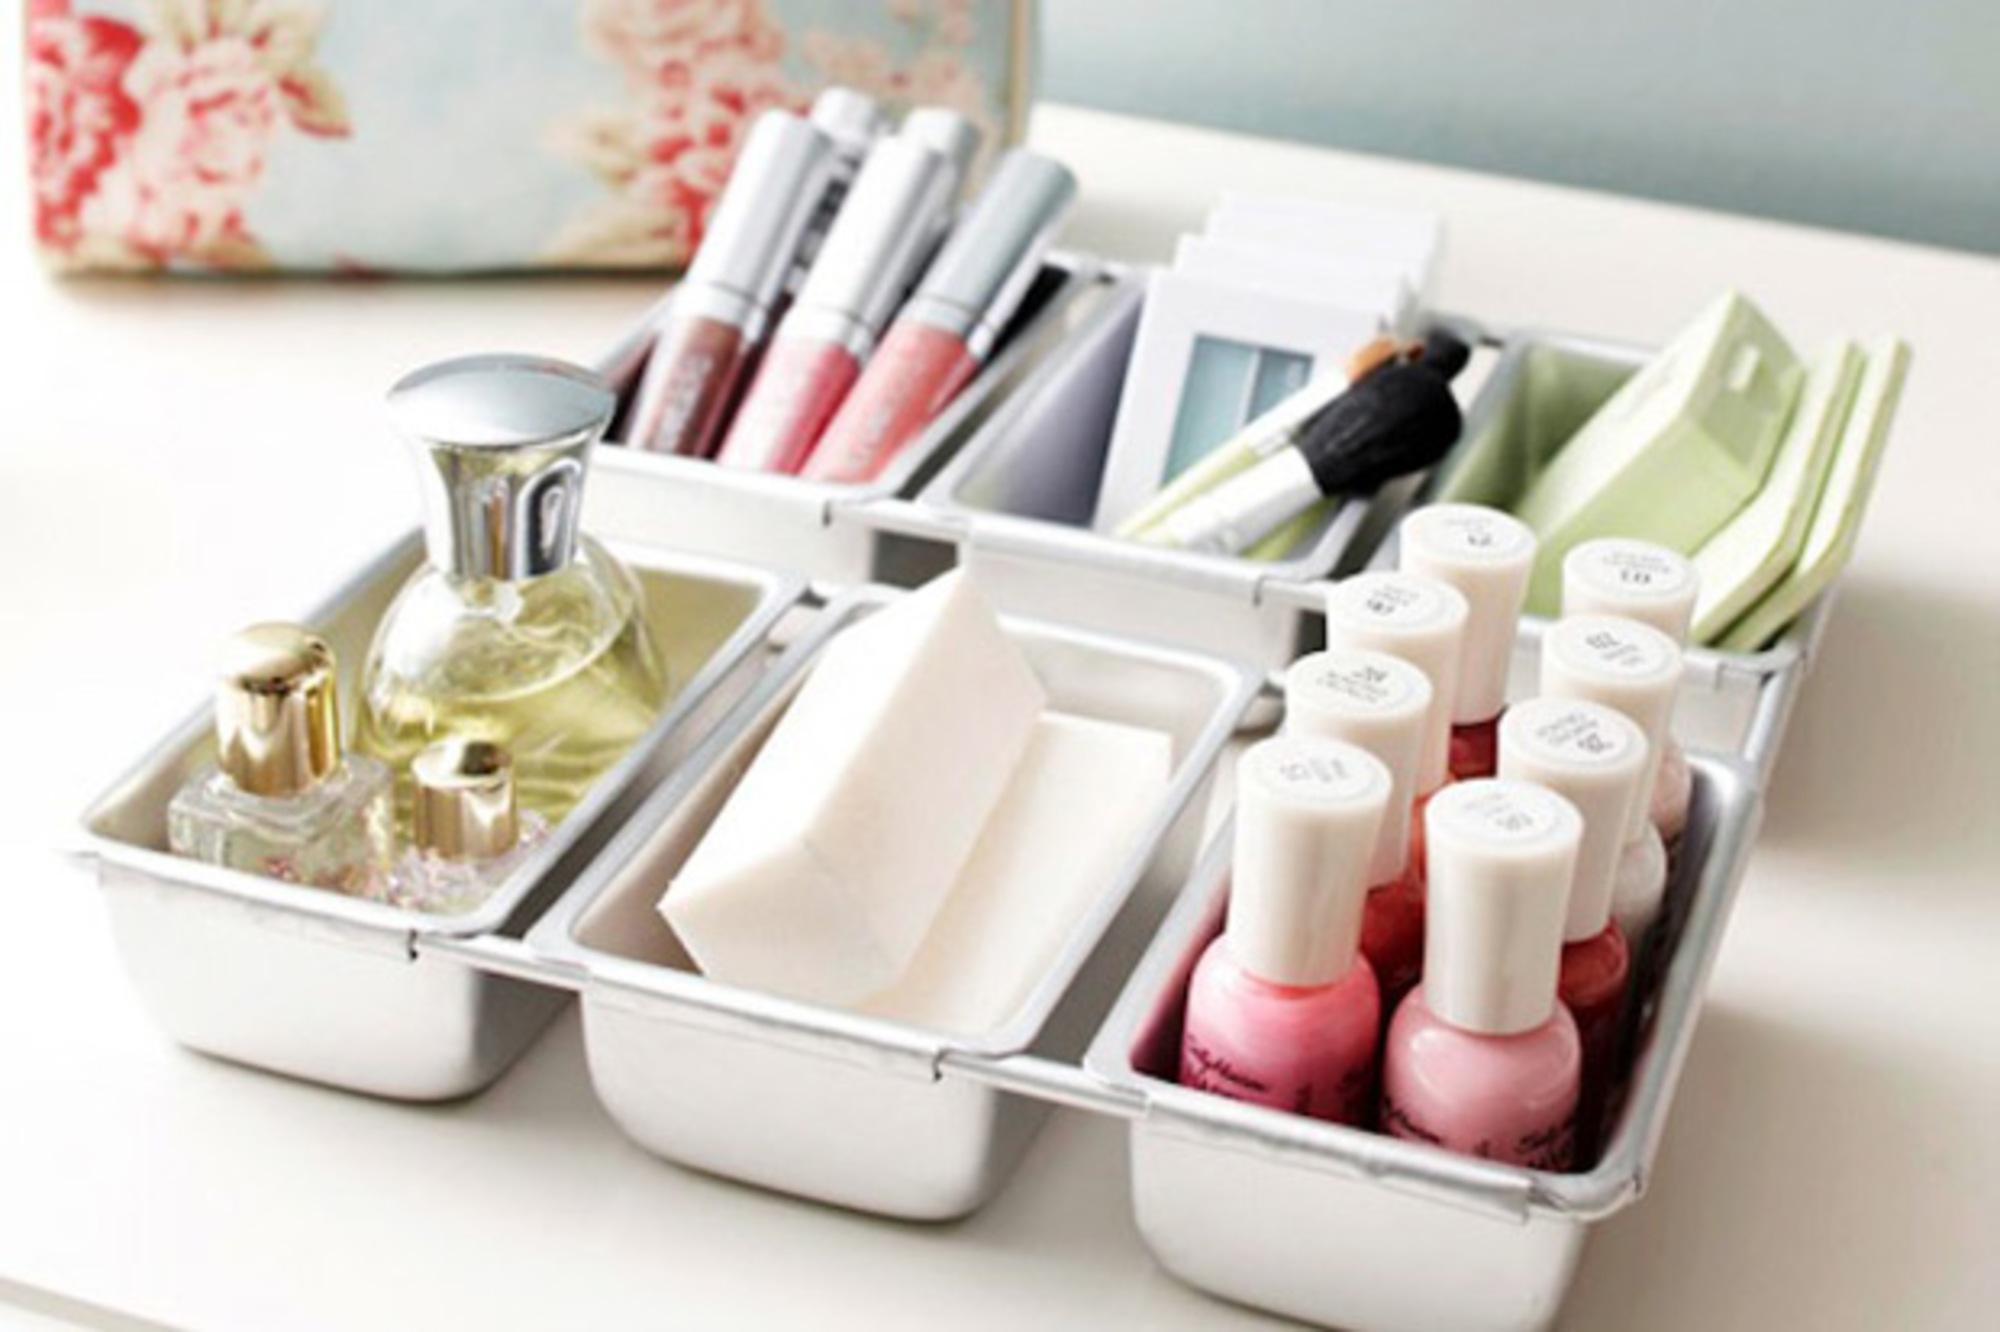 Organizando os esmaltes casa de valentina - Makeup storage ideas for small spaces design ...